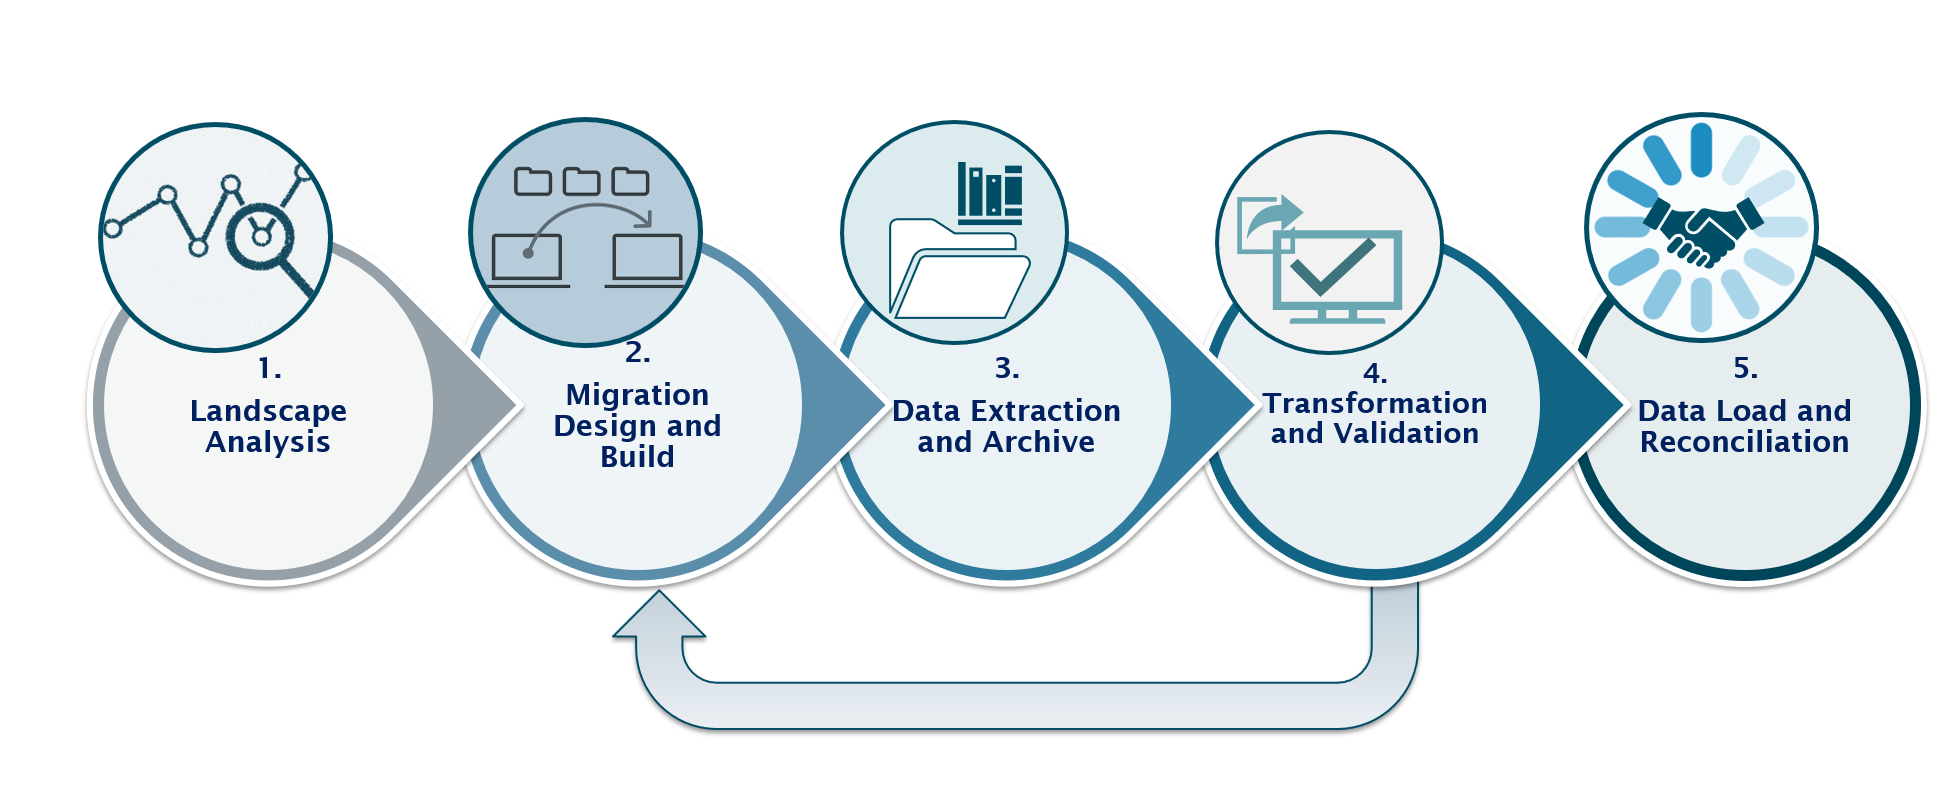 DataMigrationProcess.png